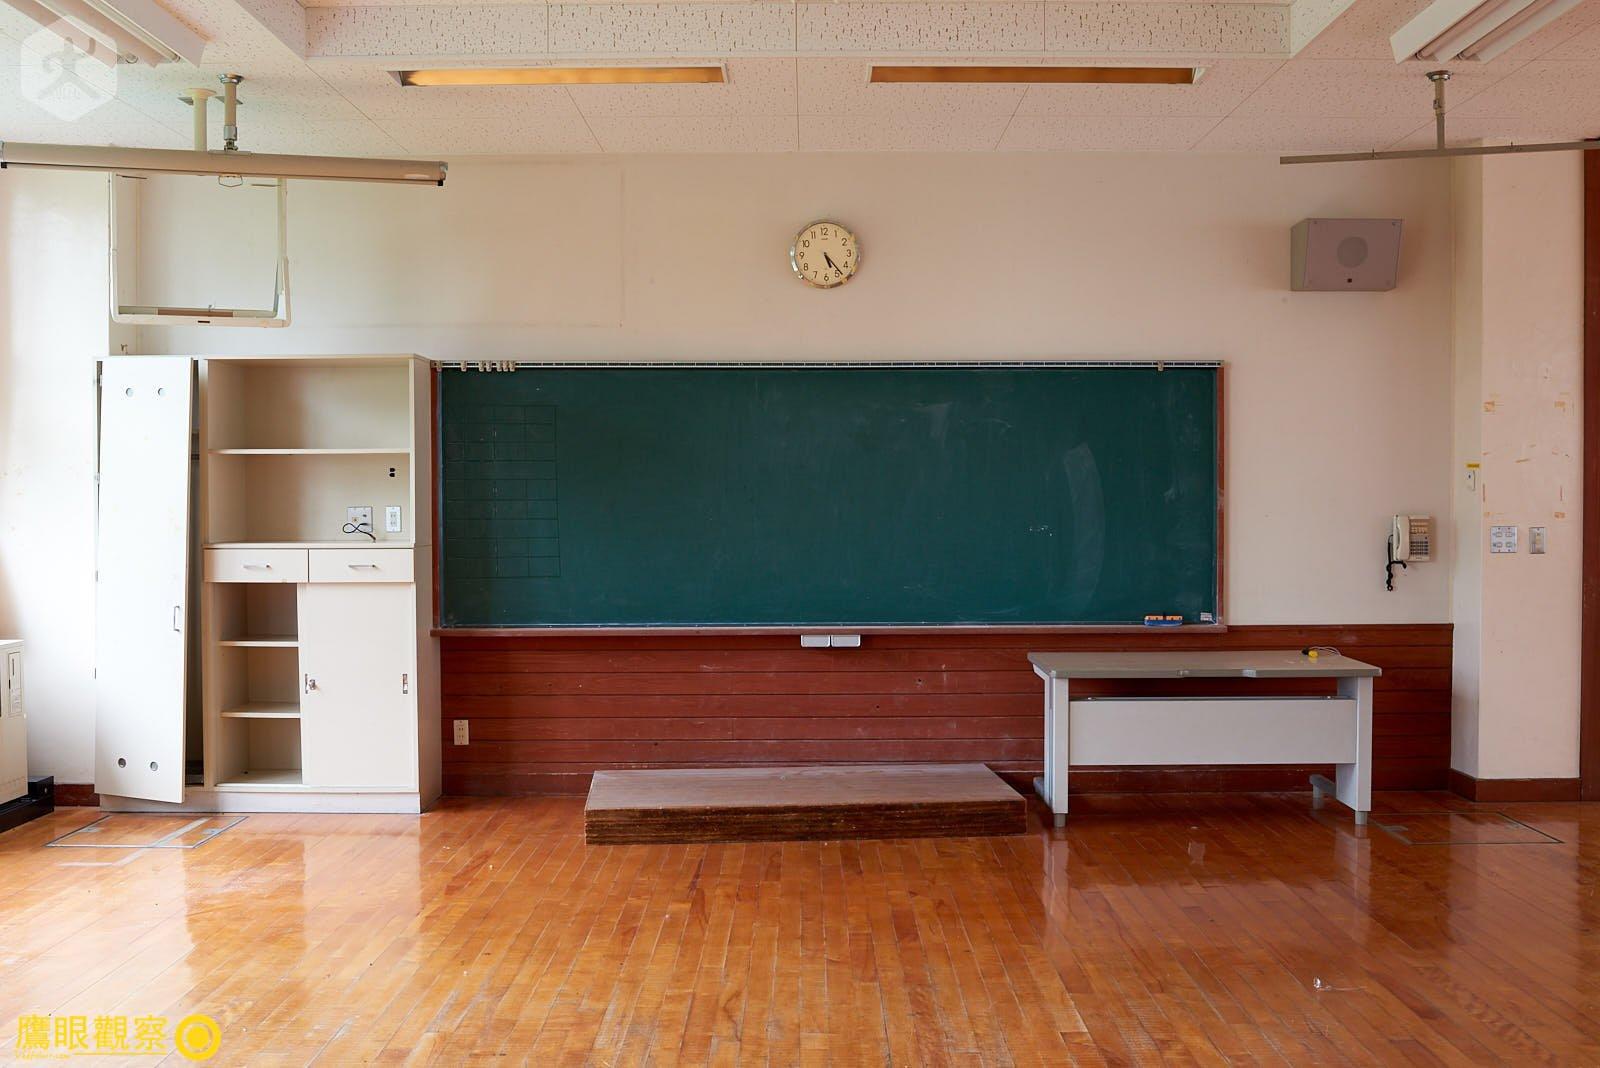 Japan Travel Kanuma Shiritsu Kuga Elementary School 20190818043428 日本廢棄小學 🚗 RV 休旅車露營、森林探險之旅(櫪木縣鹿沼市立久我小學)🇯🇵⛺️